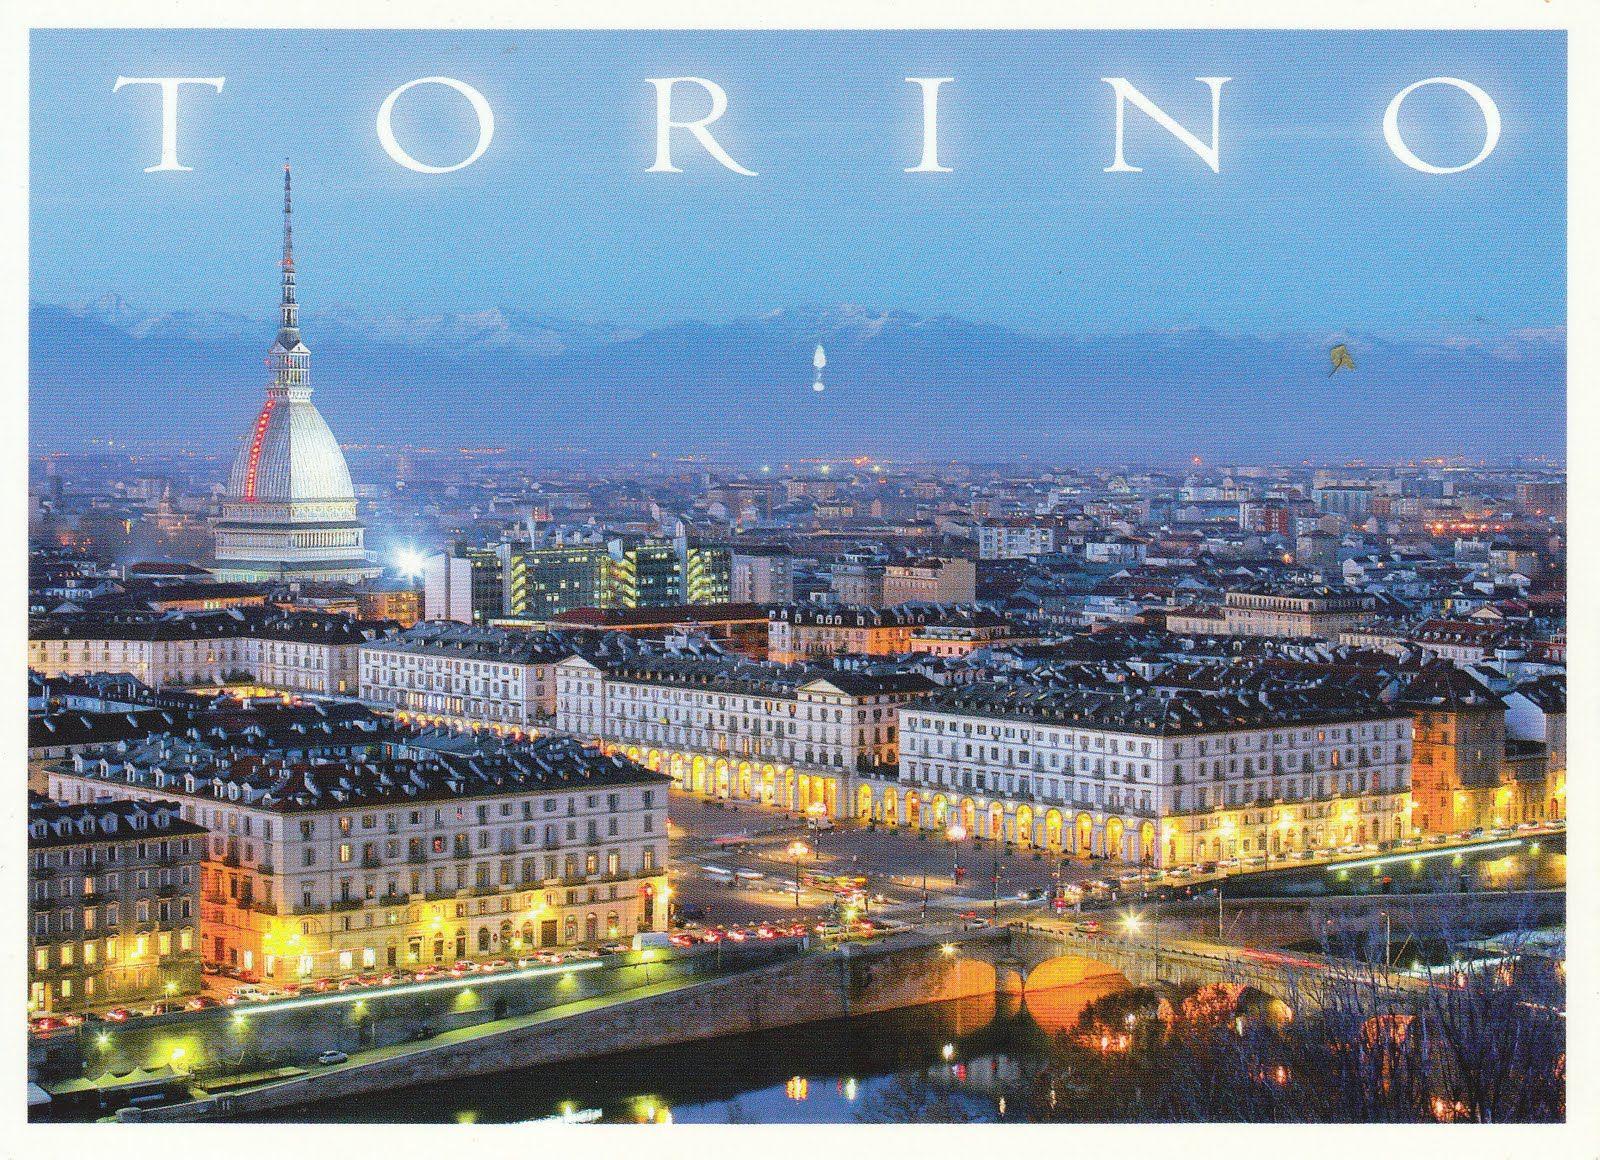 Italy Italia Torino Italy Italia Paris Skyline